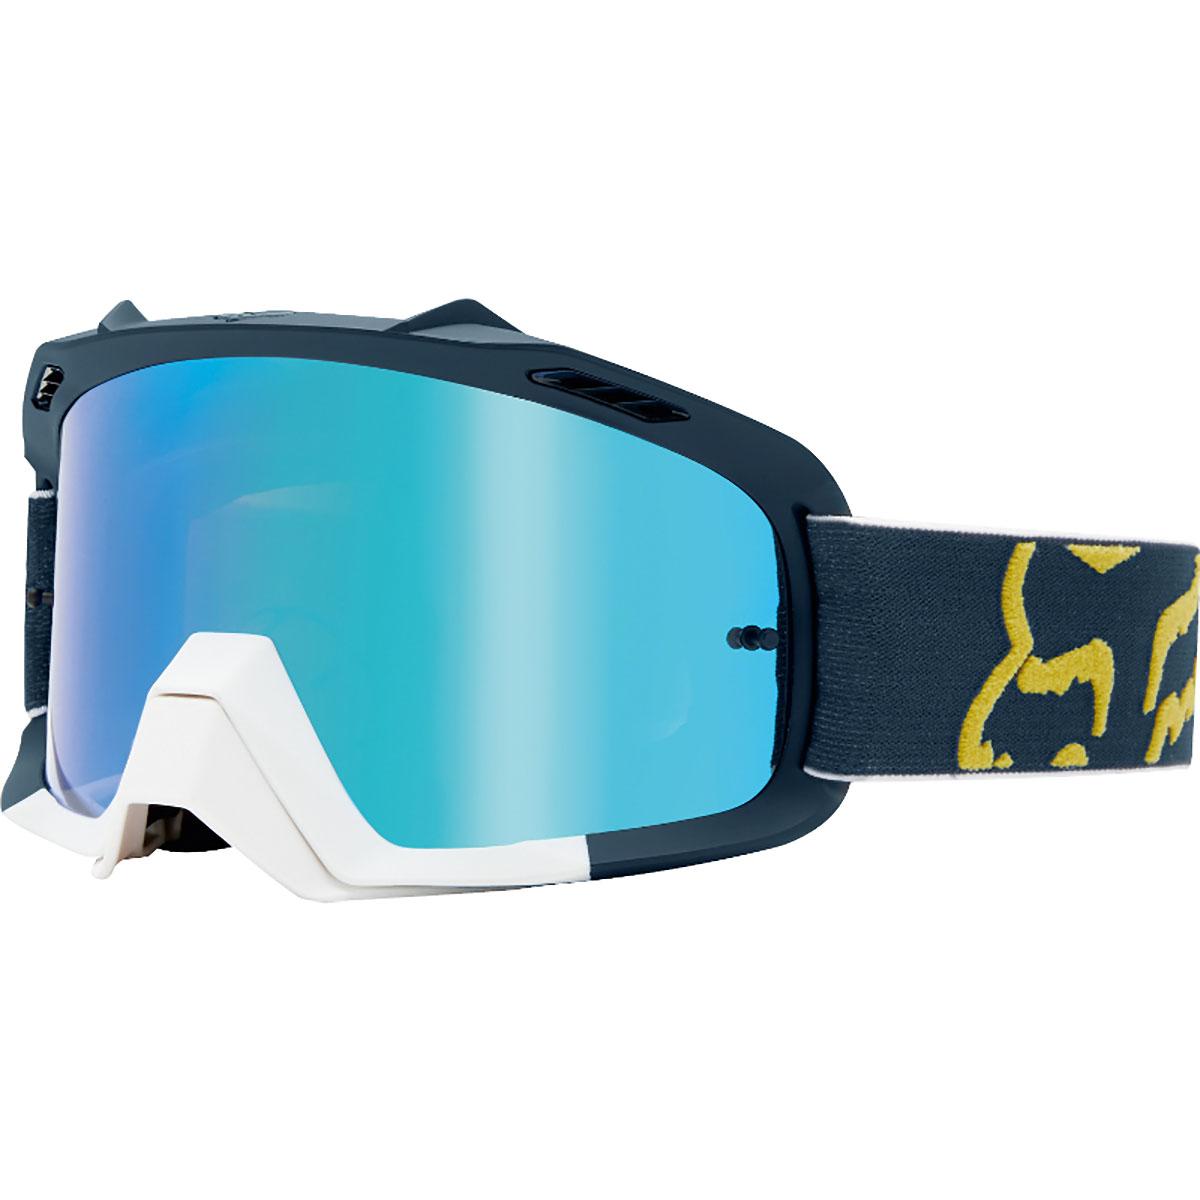 Fox gyerek cross szemüveg Air Space Preme kék